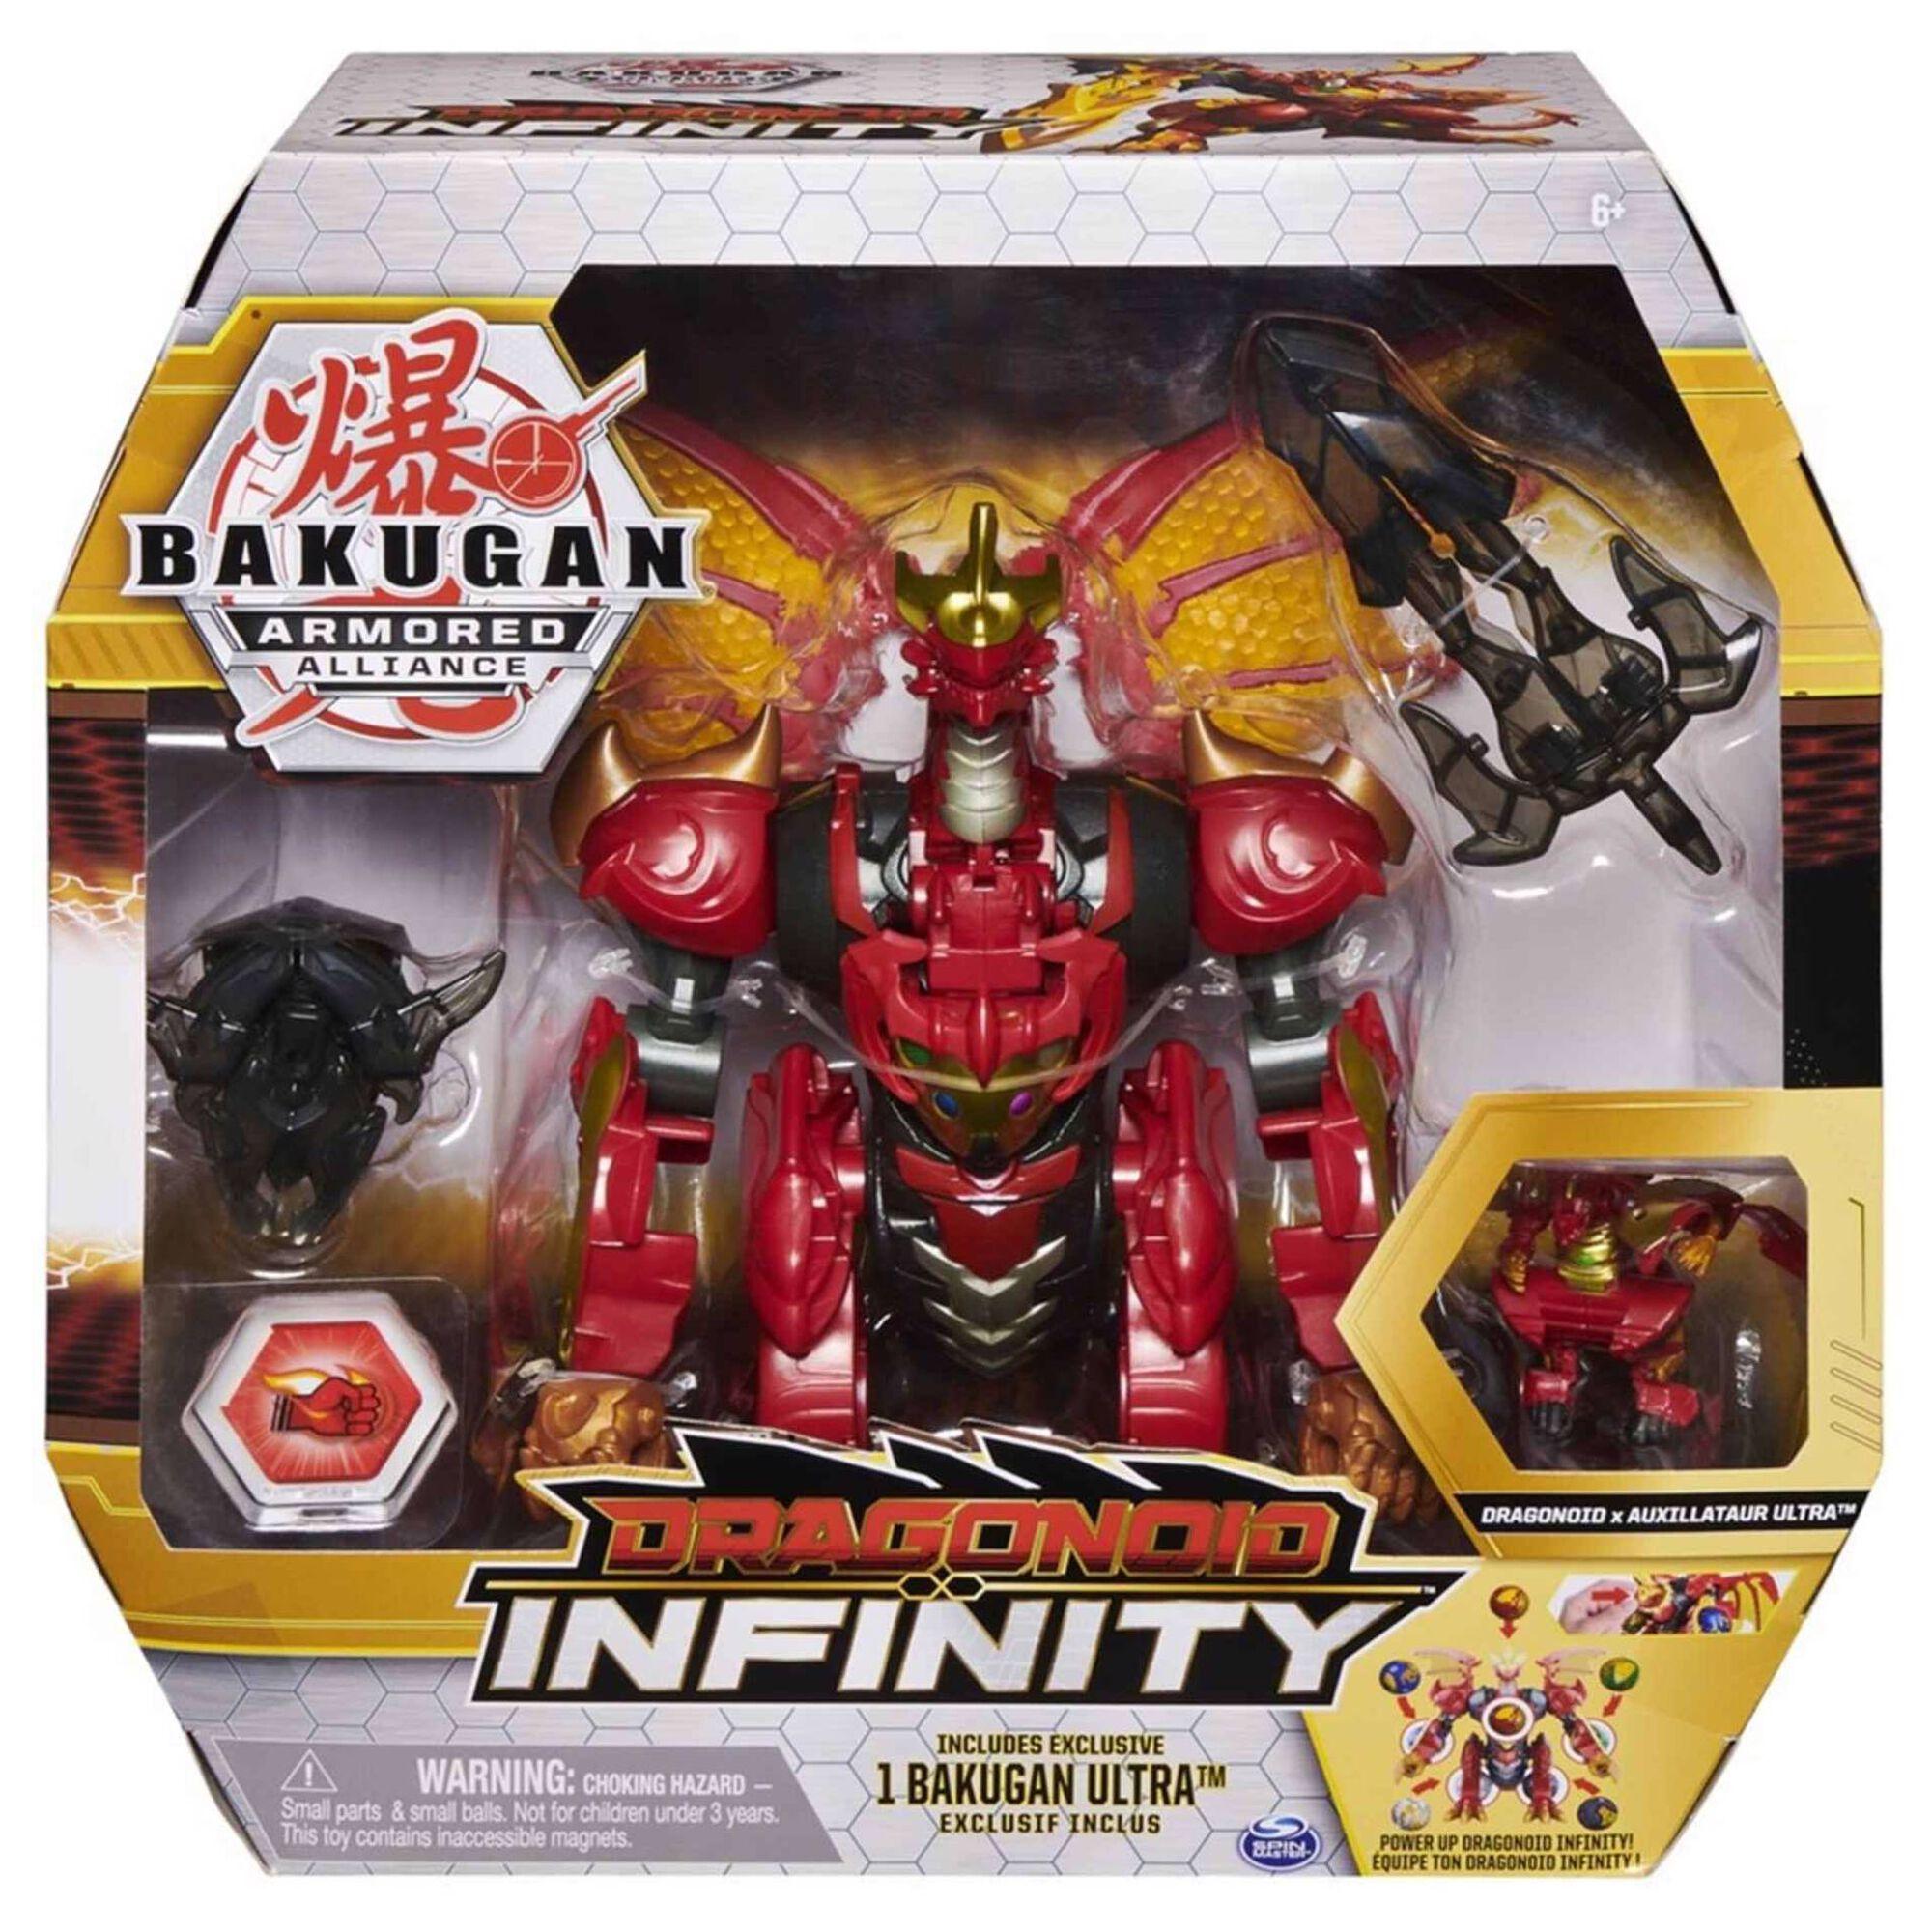 Bakugan S2 - Dragonoid Infinity